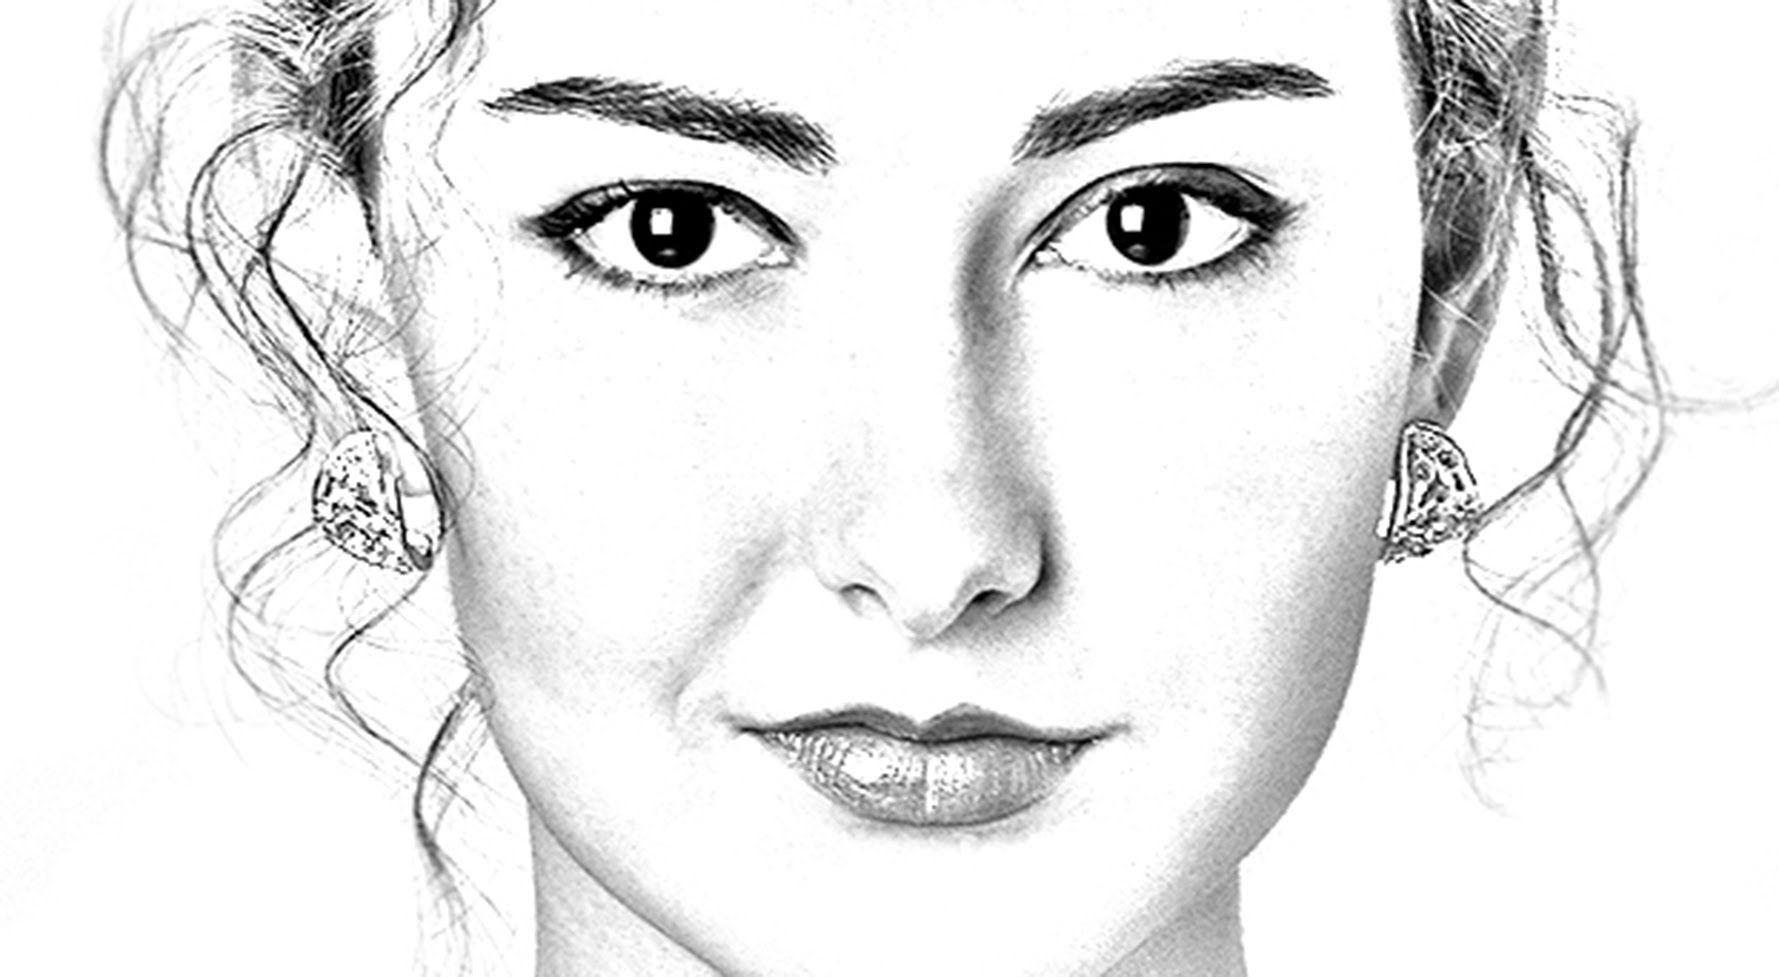 Line Art Drawing Tutorial : Bleistiftzeichnung mit photoshop drawings and